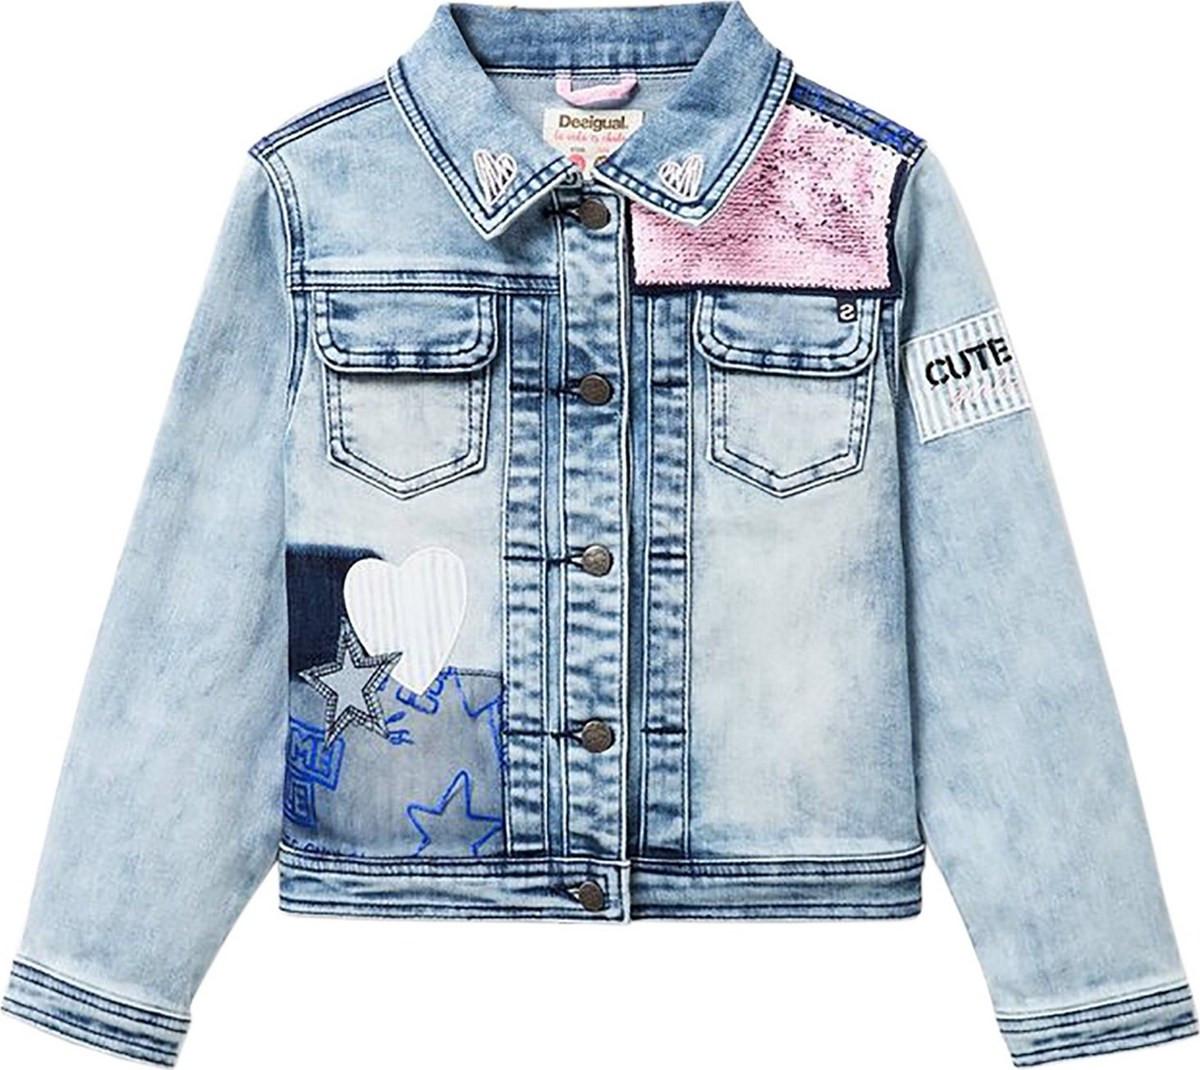 73d1a52a665 girls jacket - Μπουφάν Κοριτσιών Desigual | BestPrice.gr